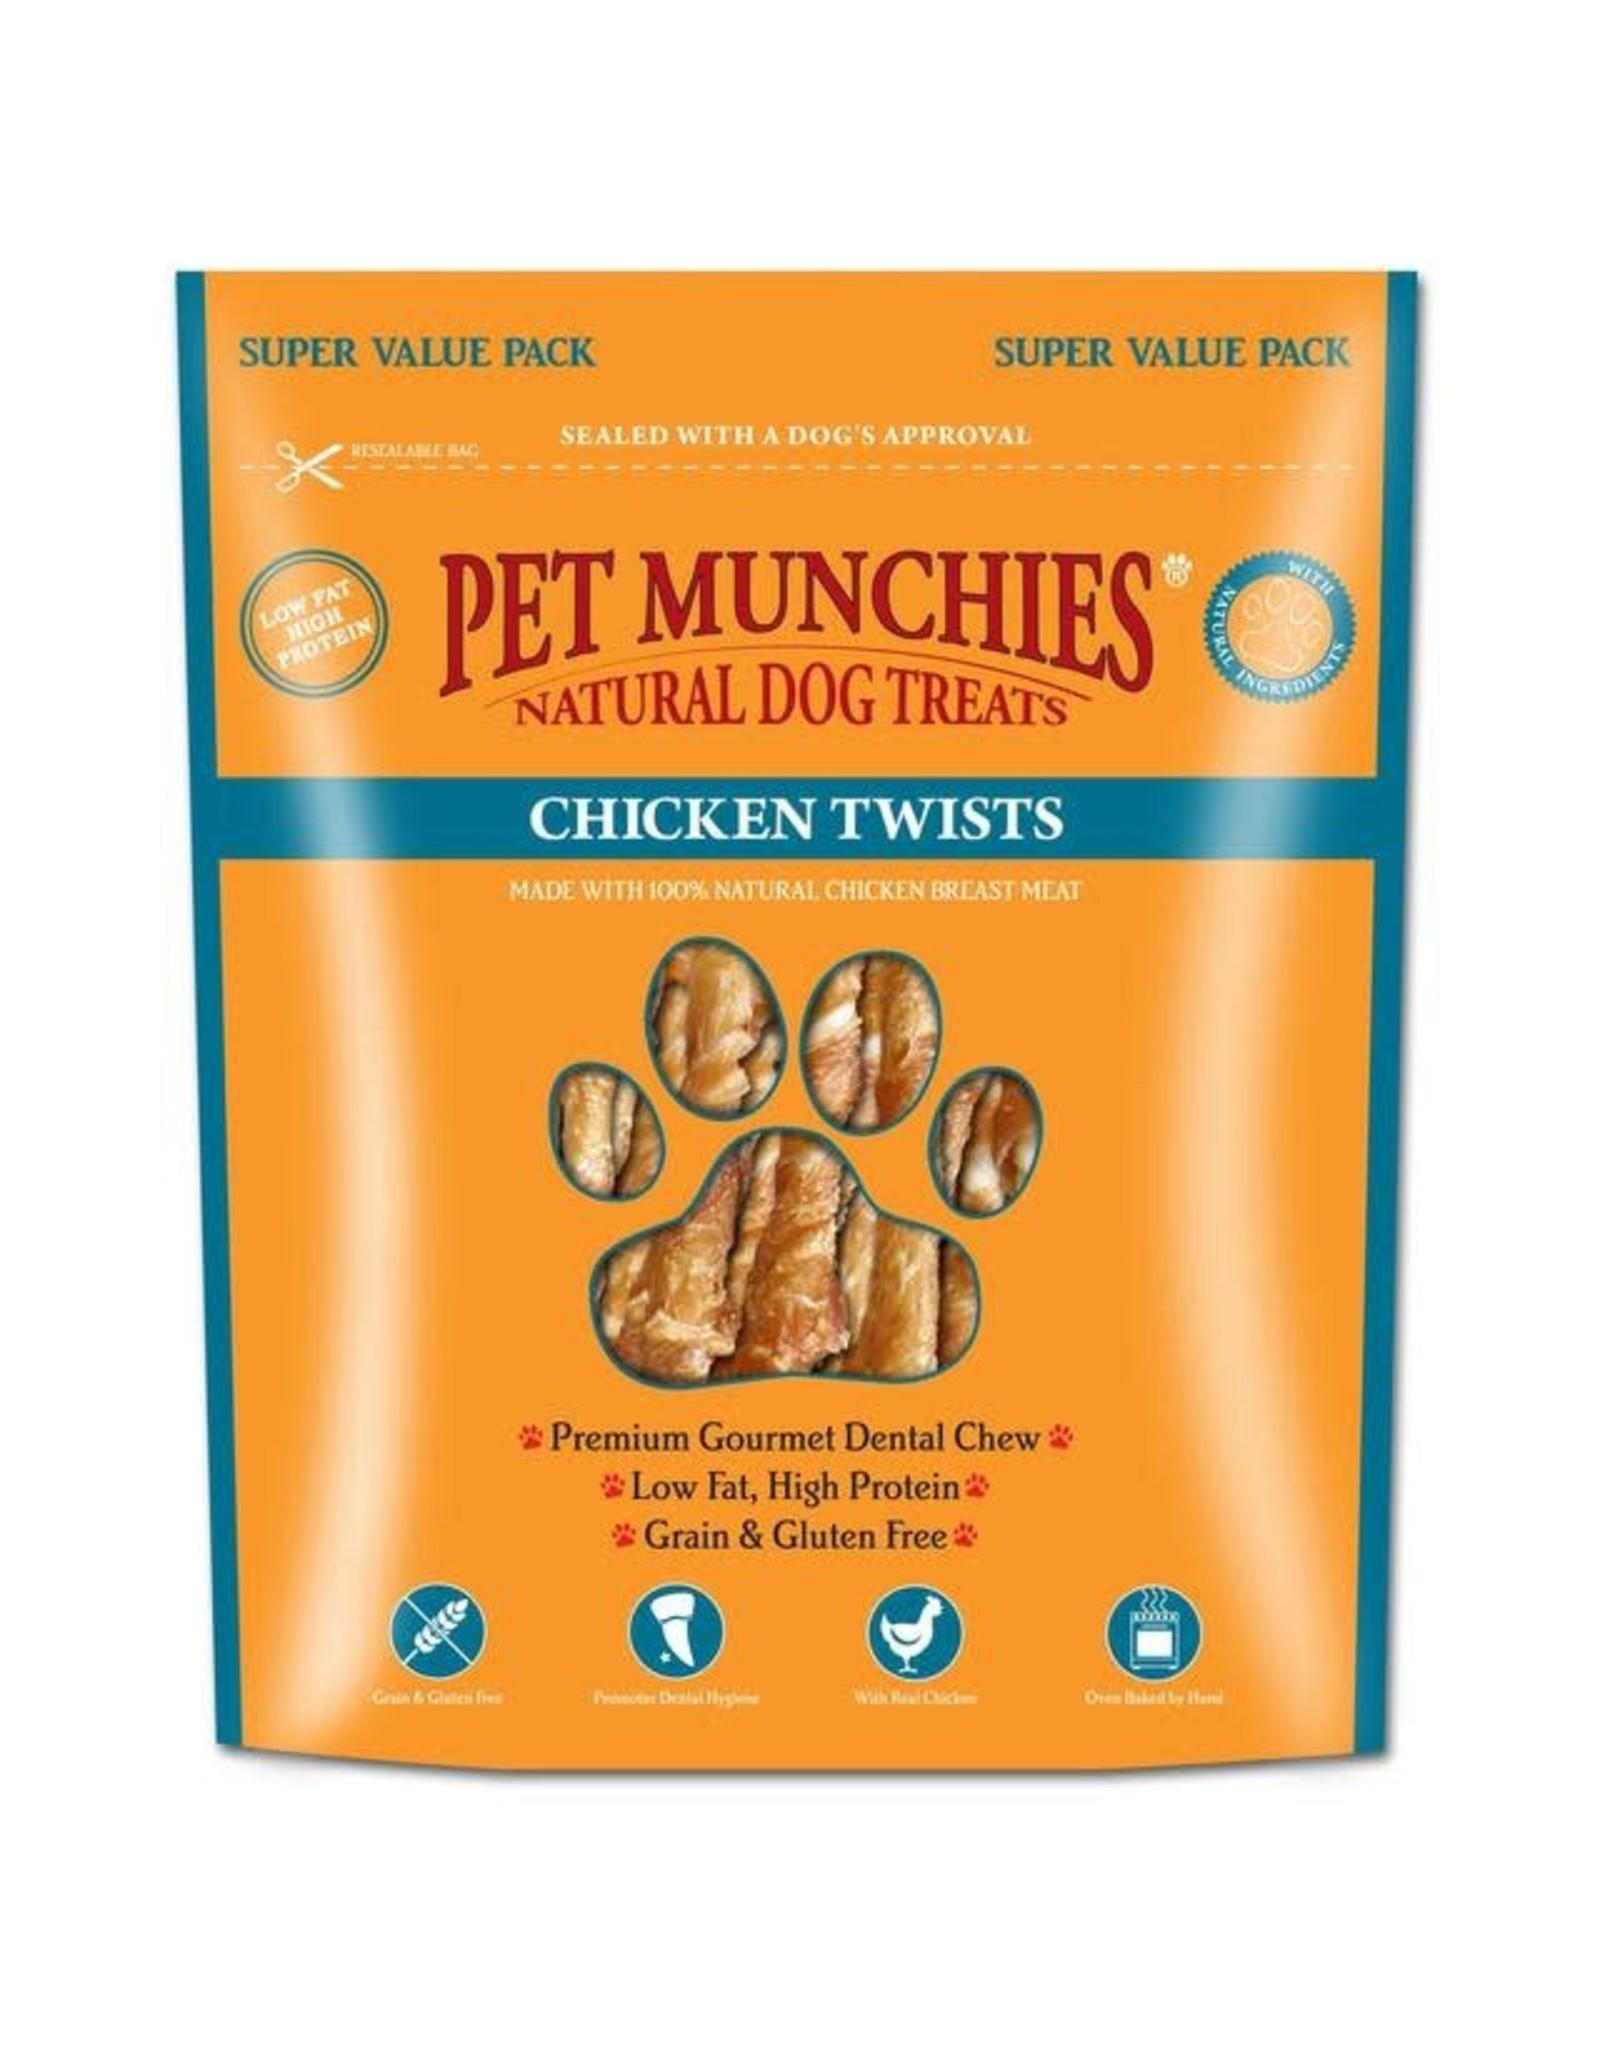 Pet Munchies Chicken Twists Natural Dog Treats, 290g